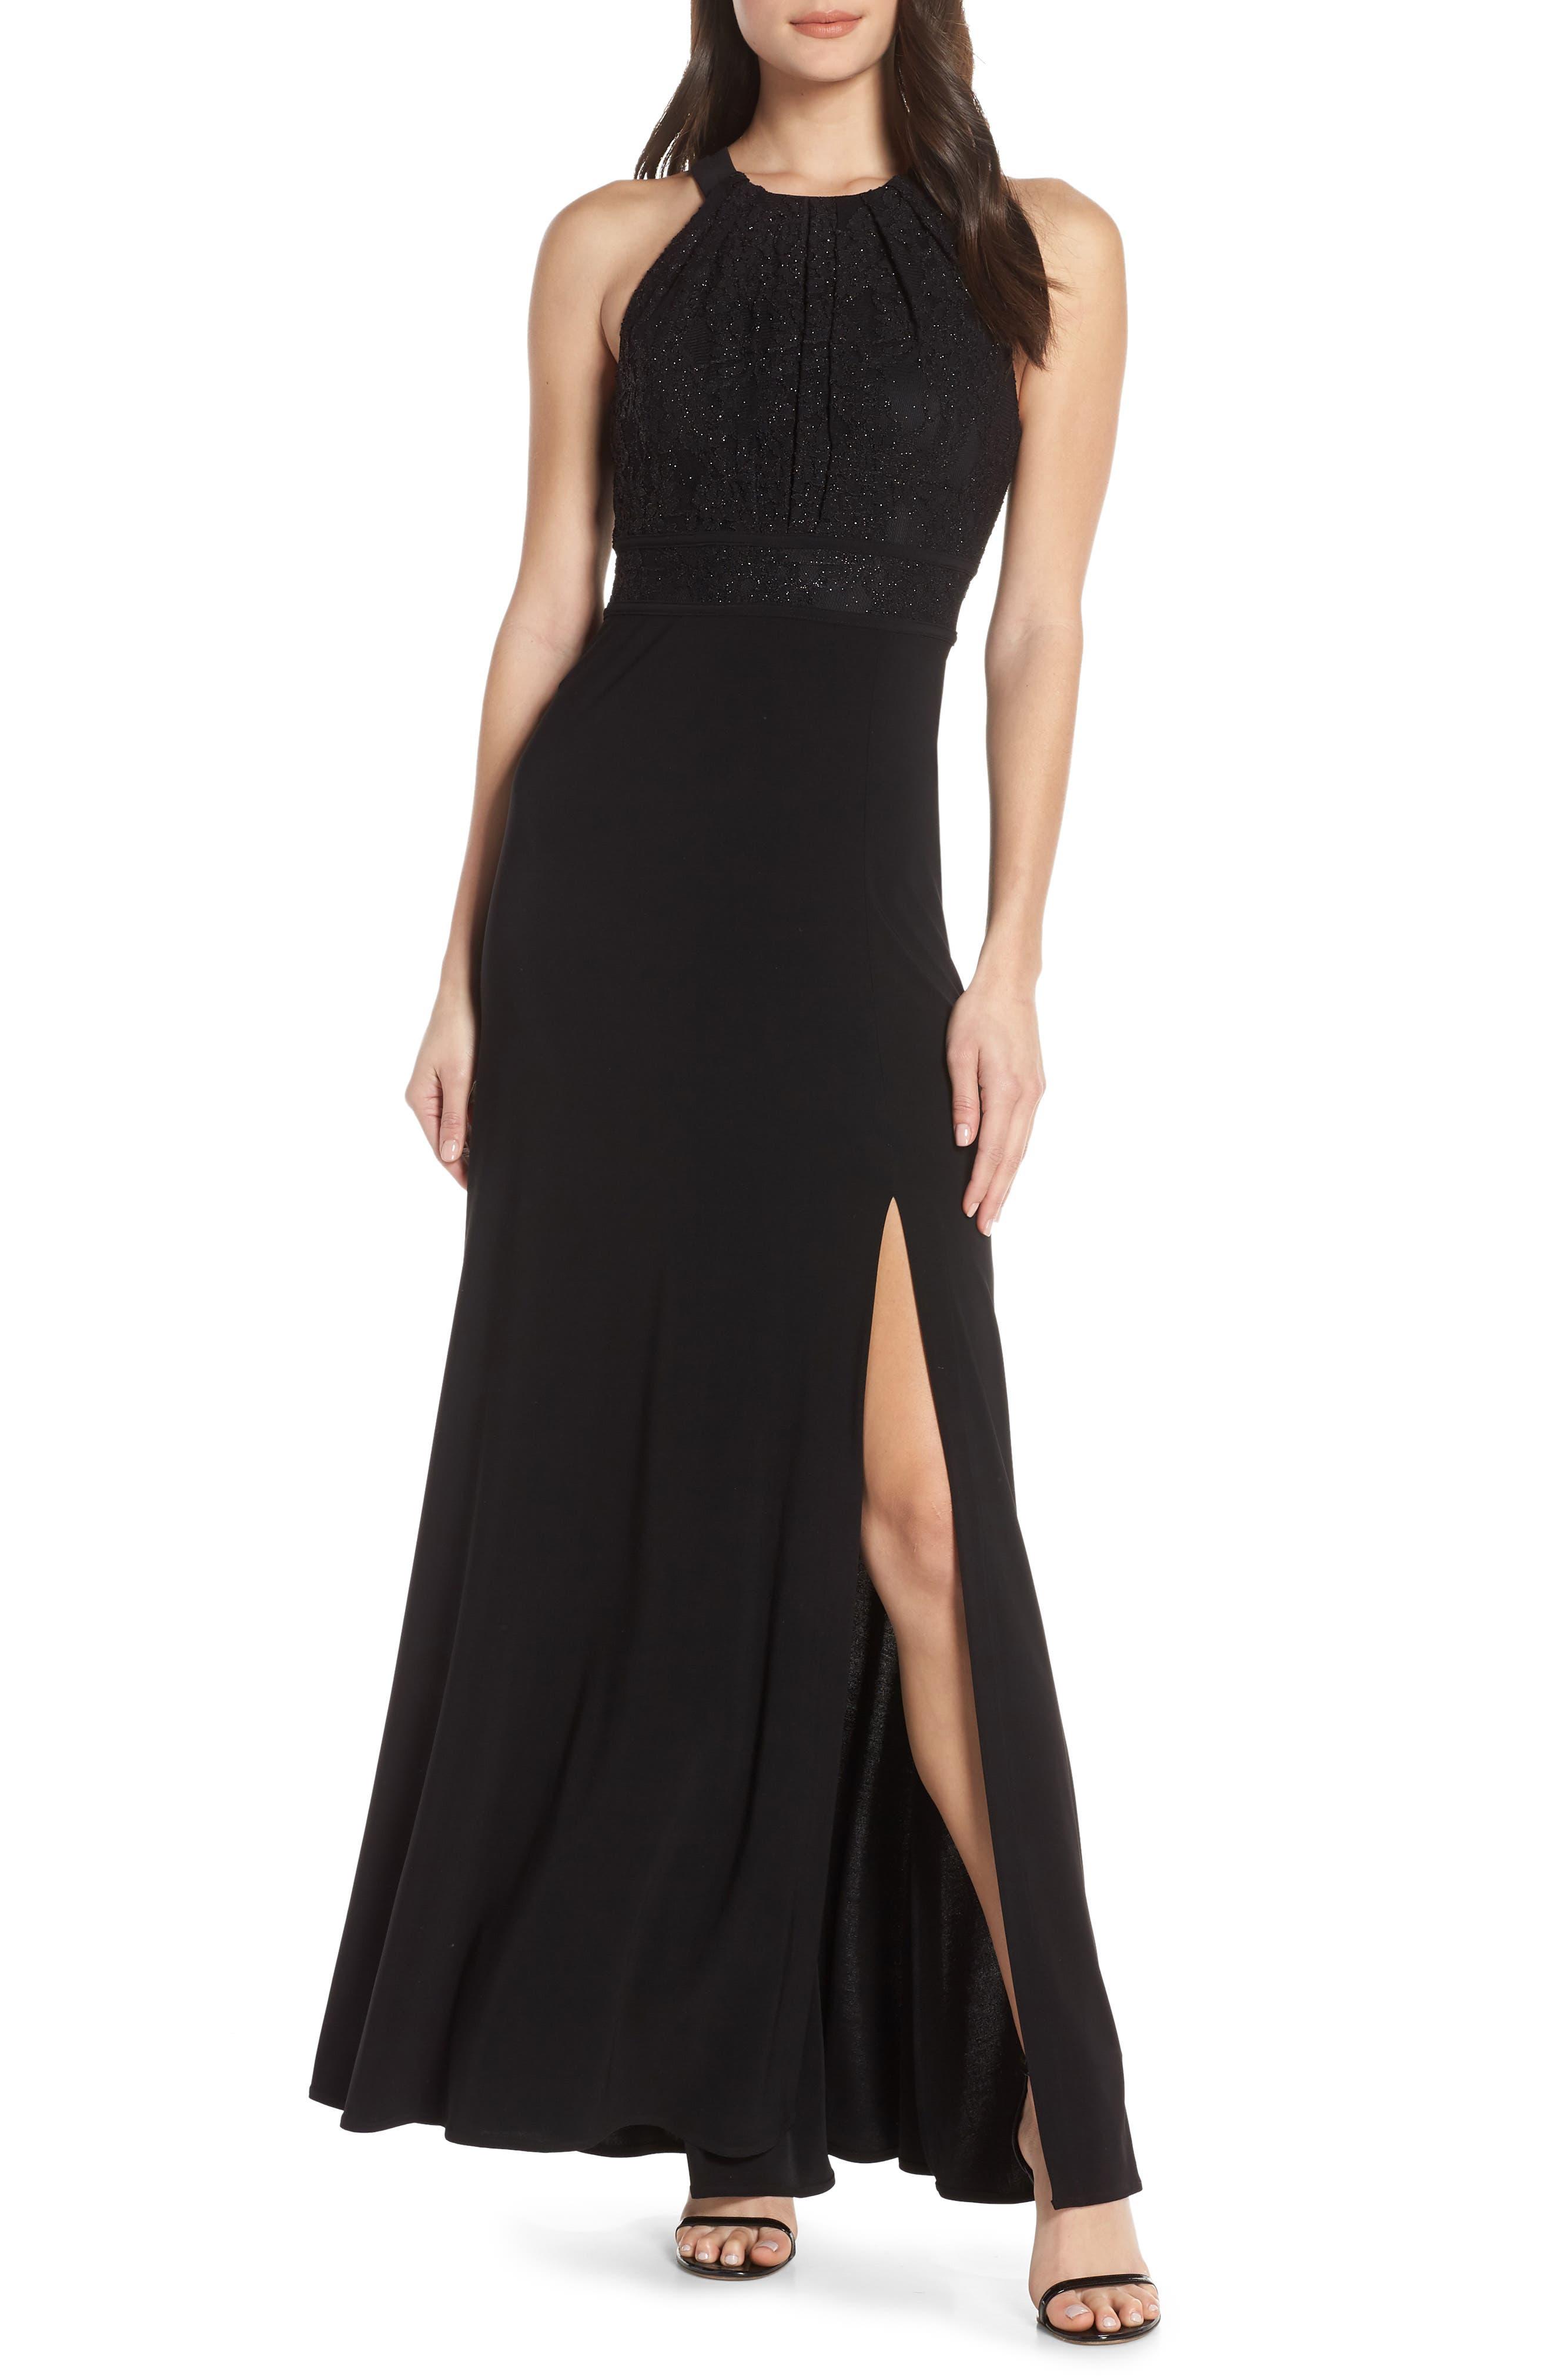 Morgan & Co. Pleat Lace Bodice Evening Dress, /10 - Black